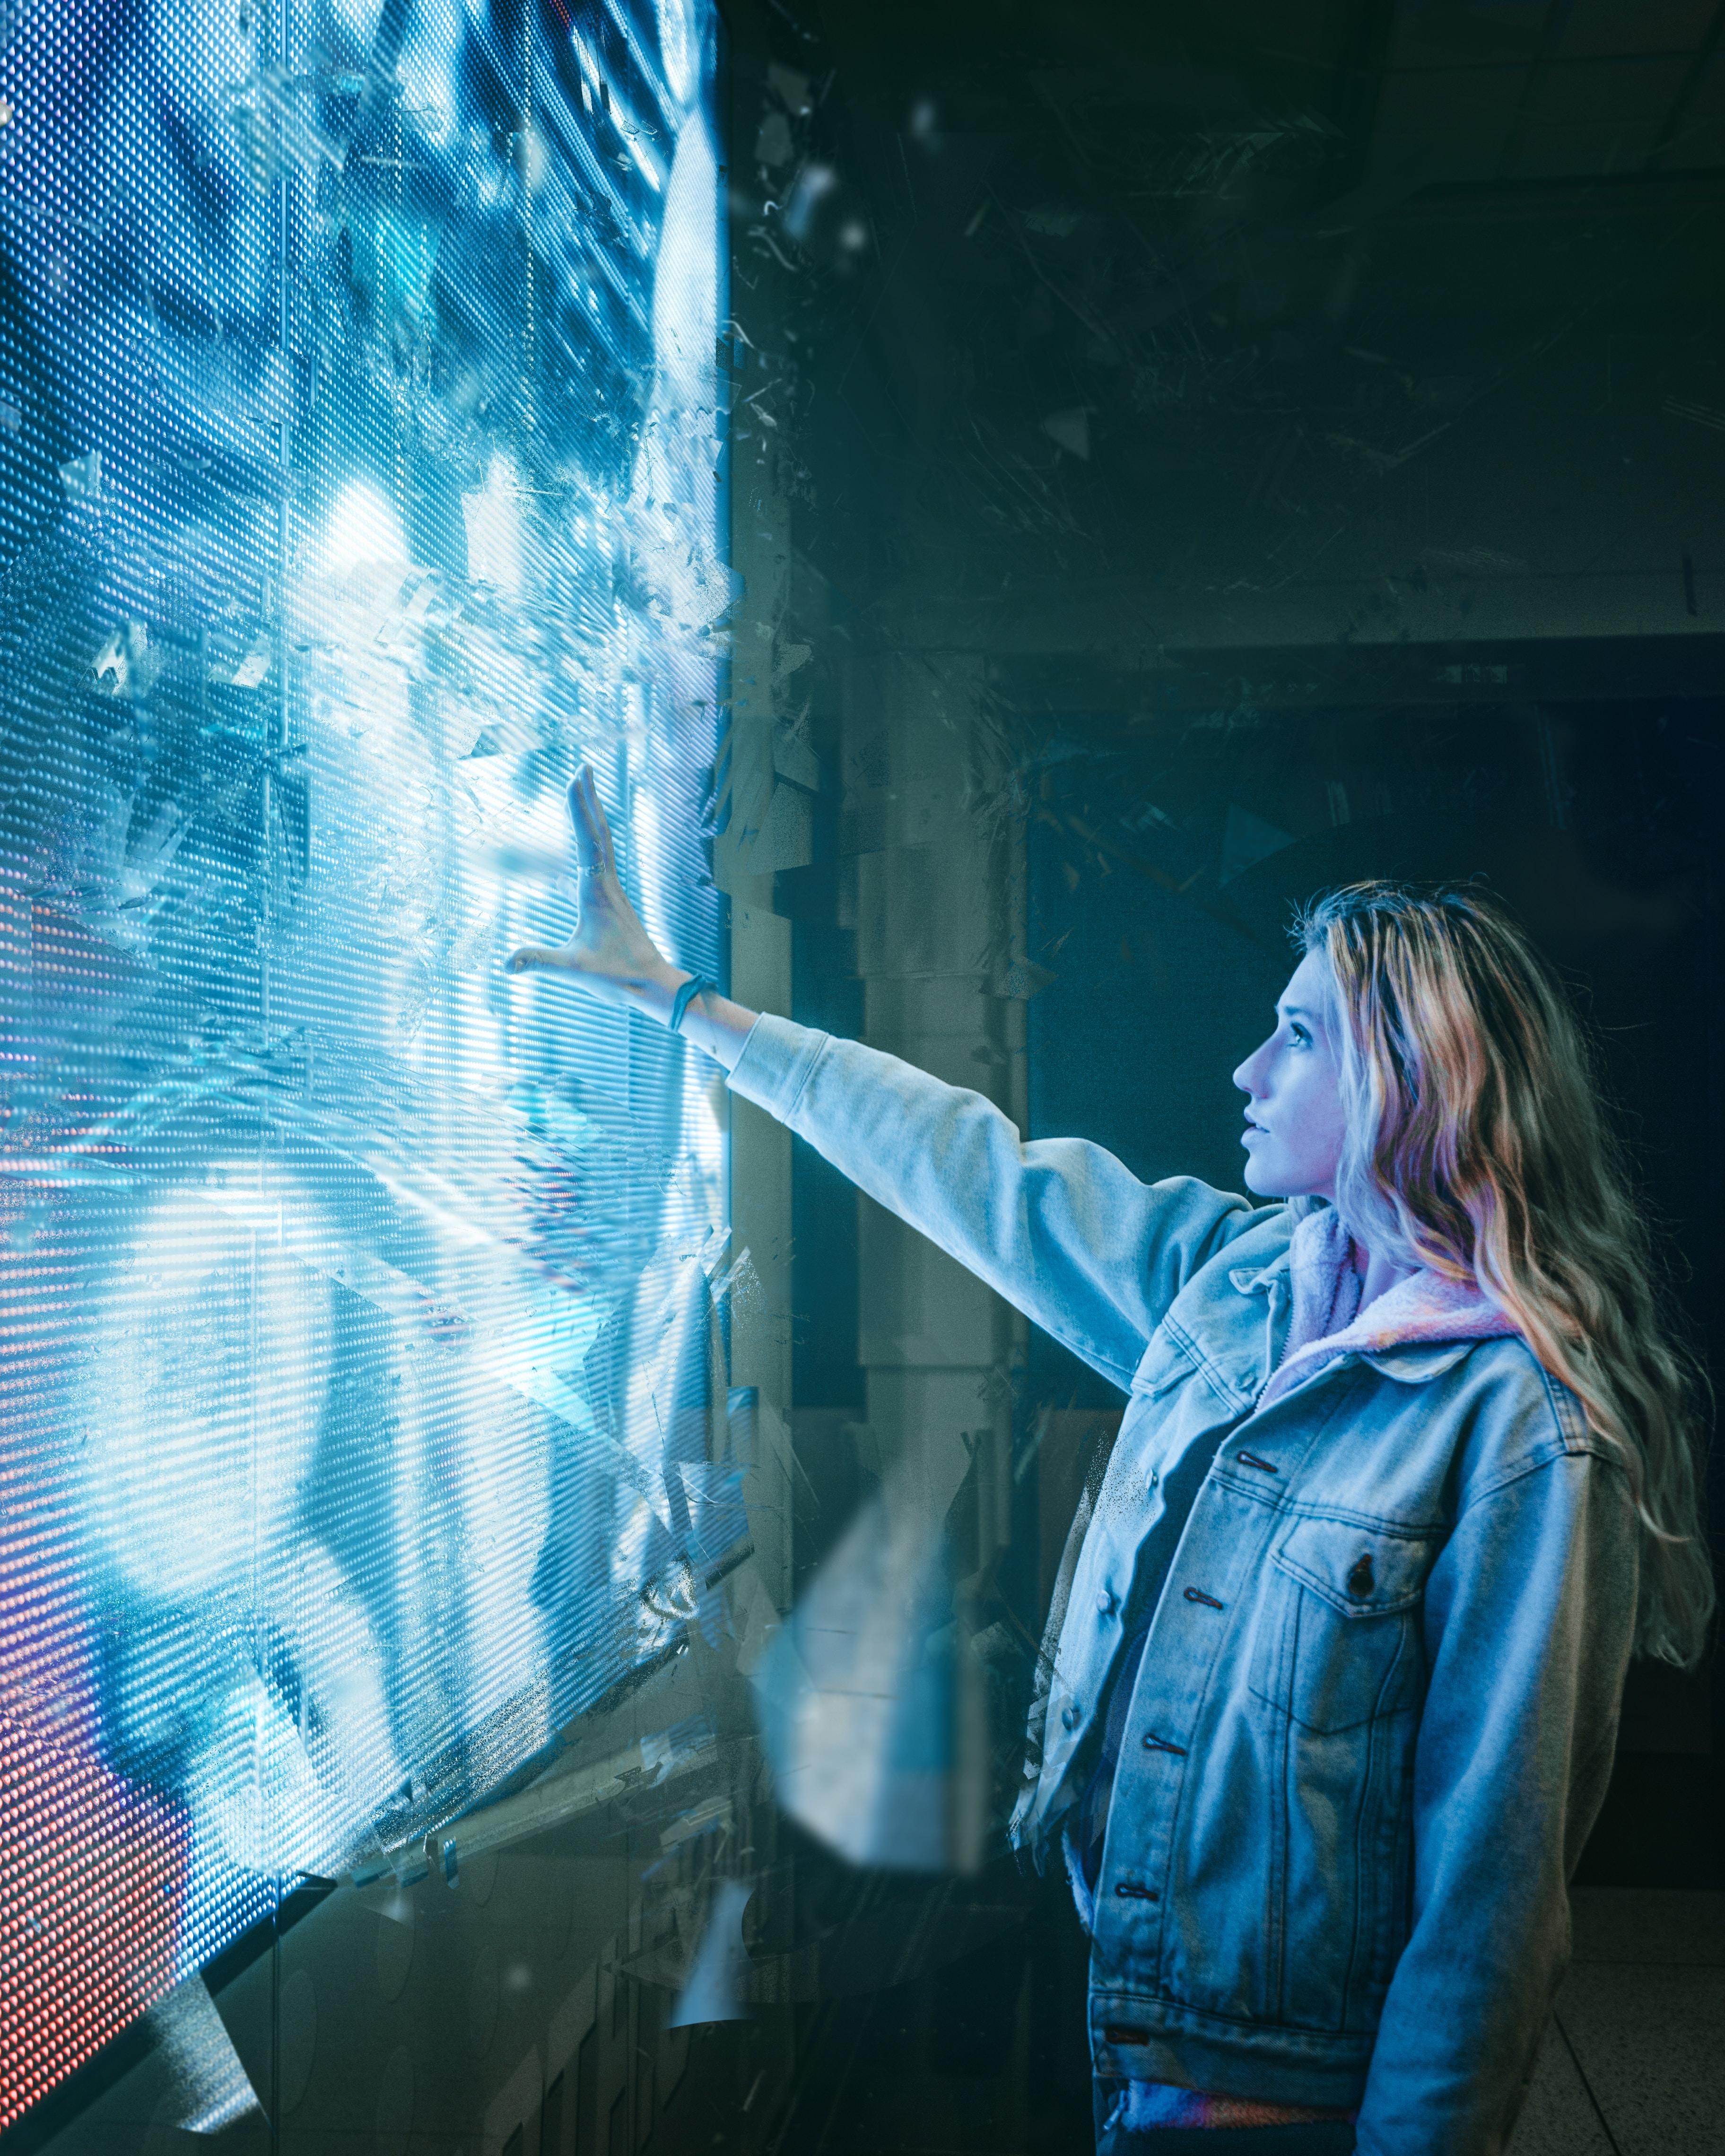 A lady touching a high tech screen.